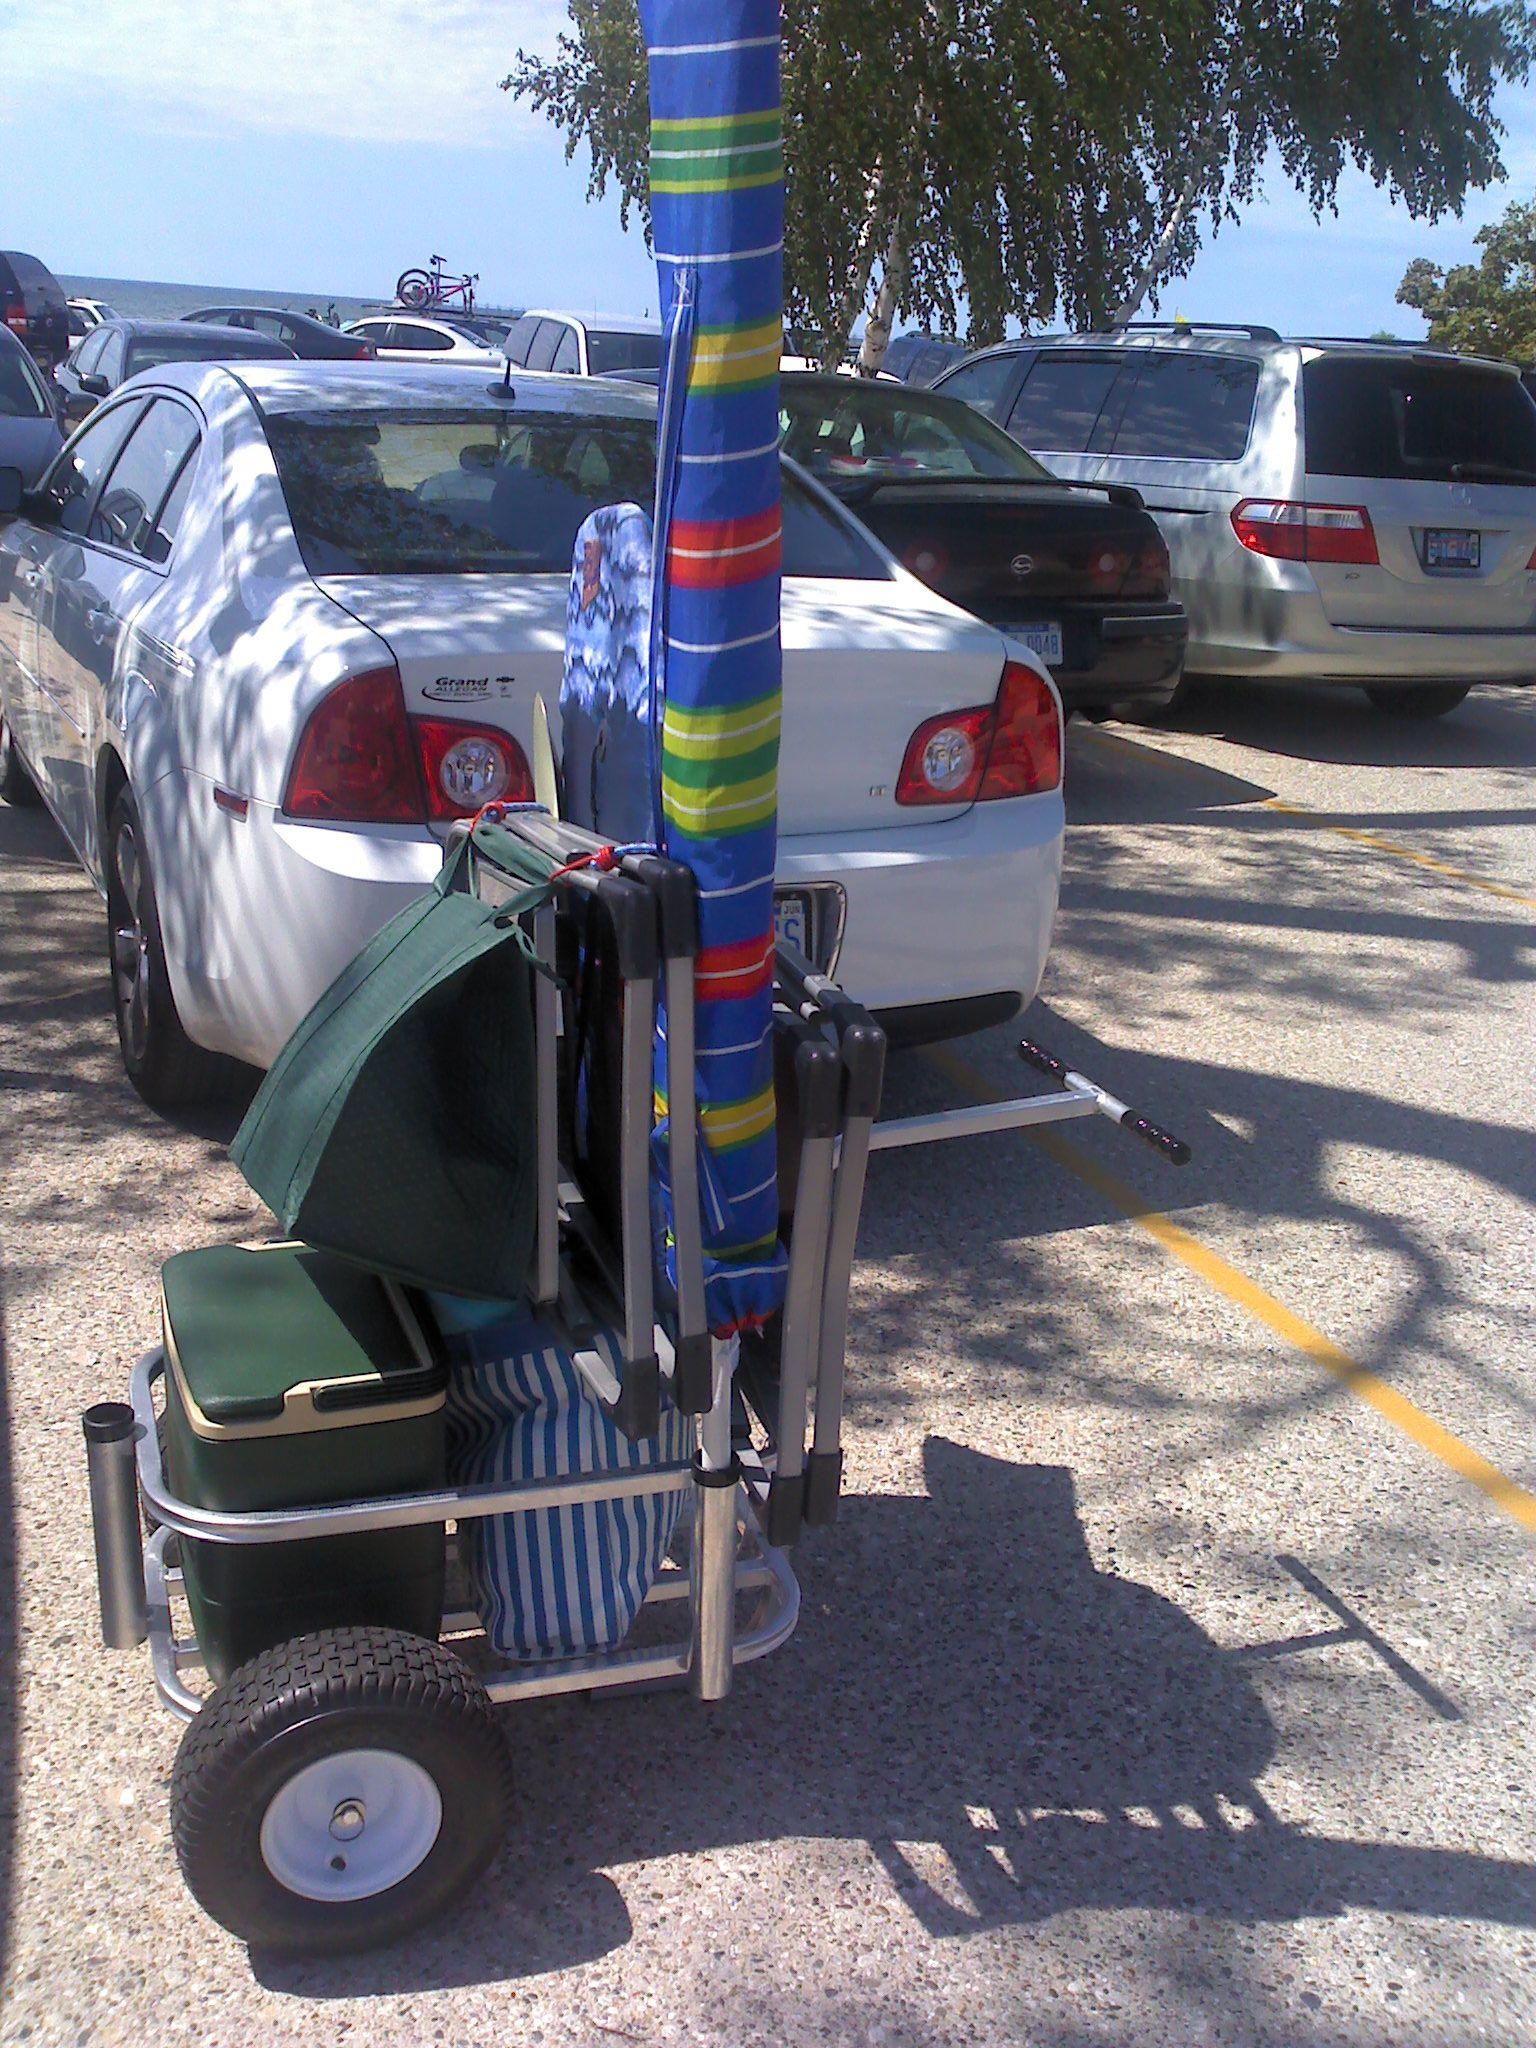 beach cart fully loaded. Cooler,snack bag, beach bag